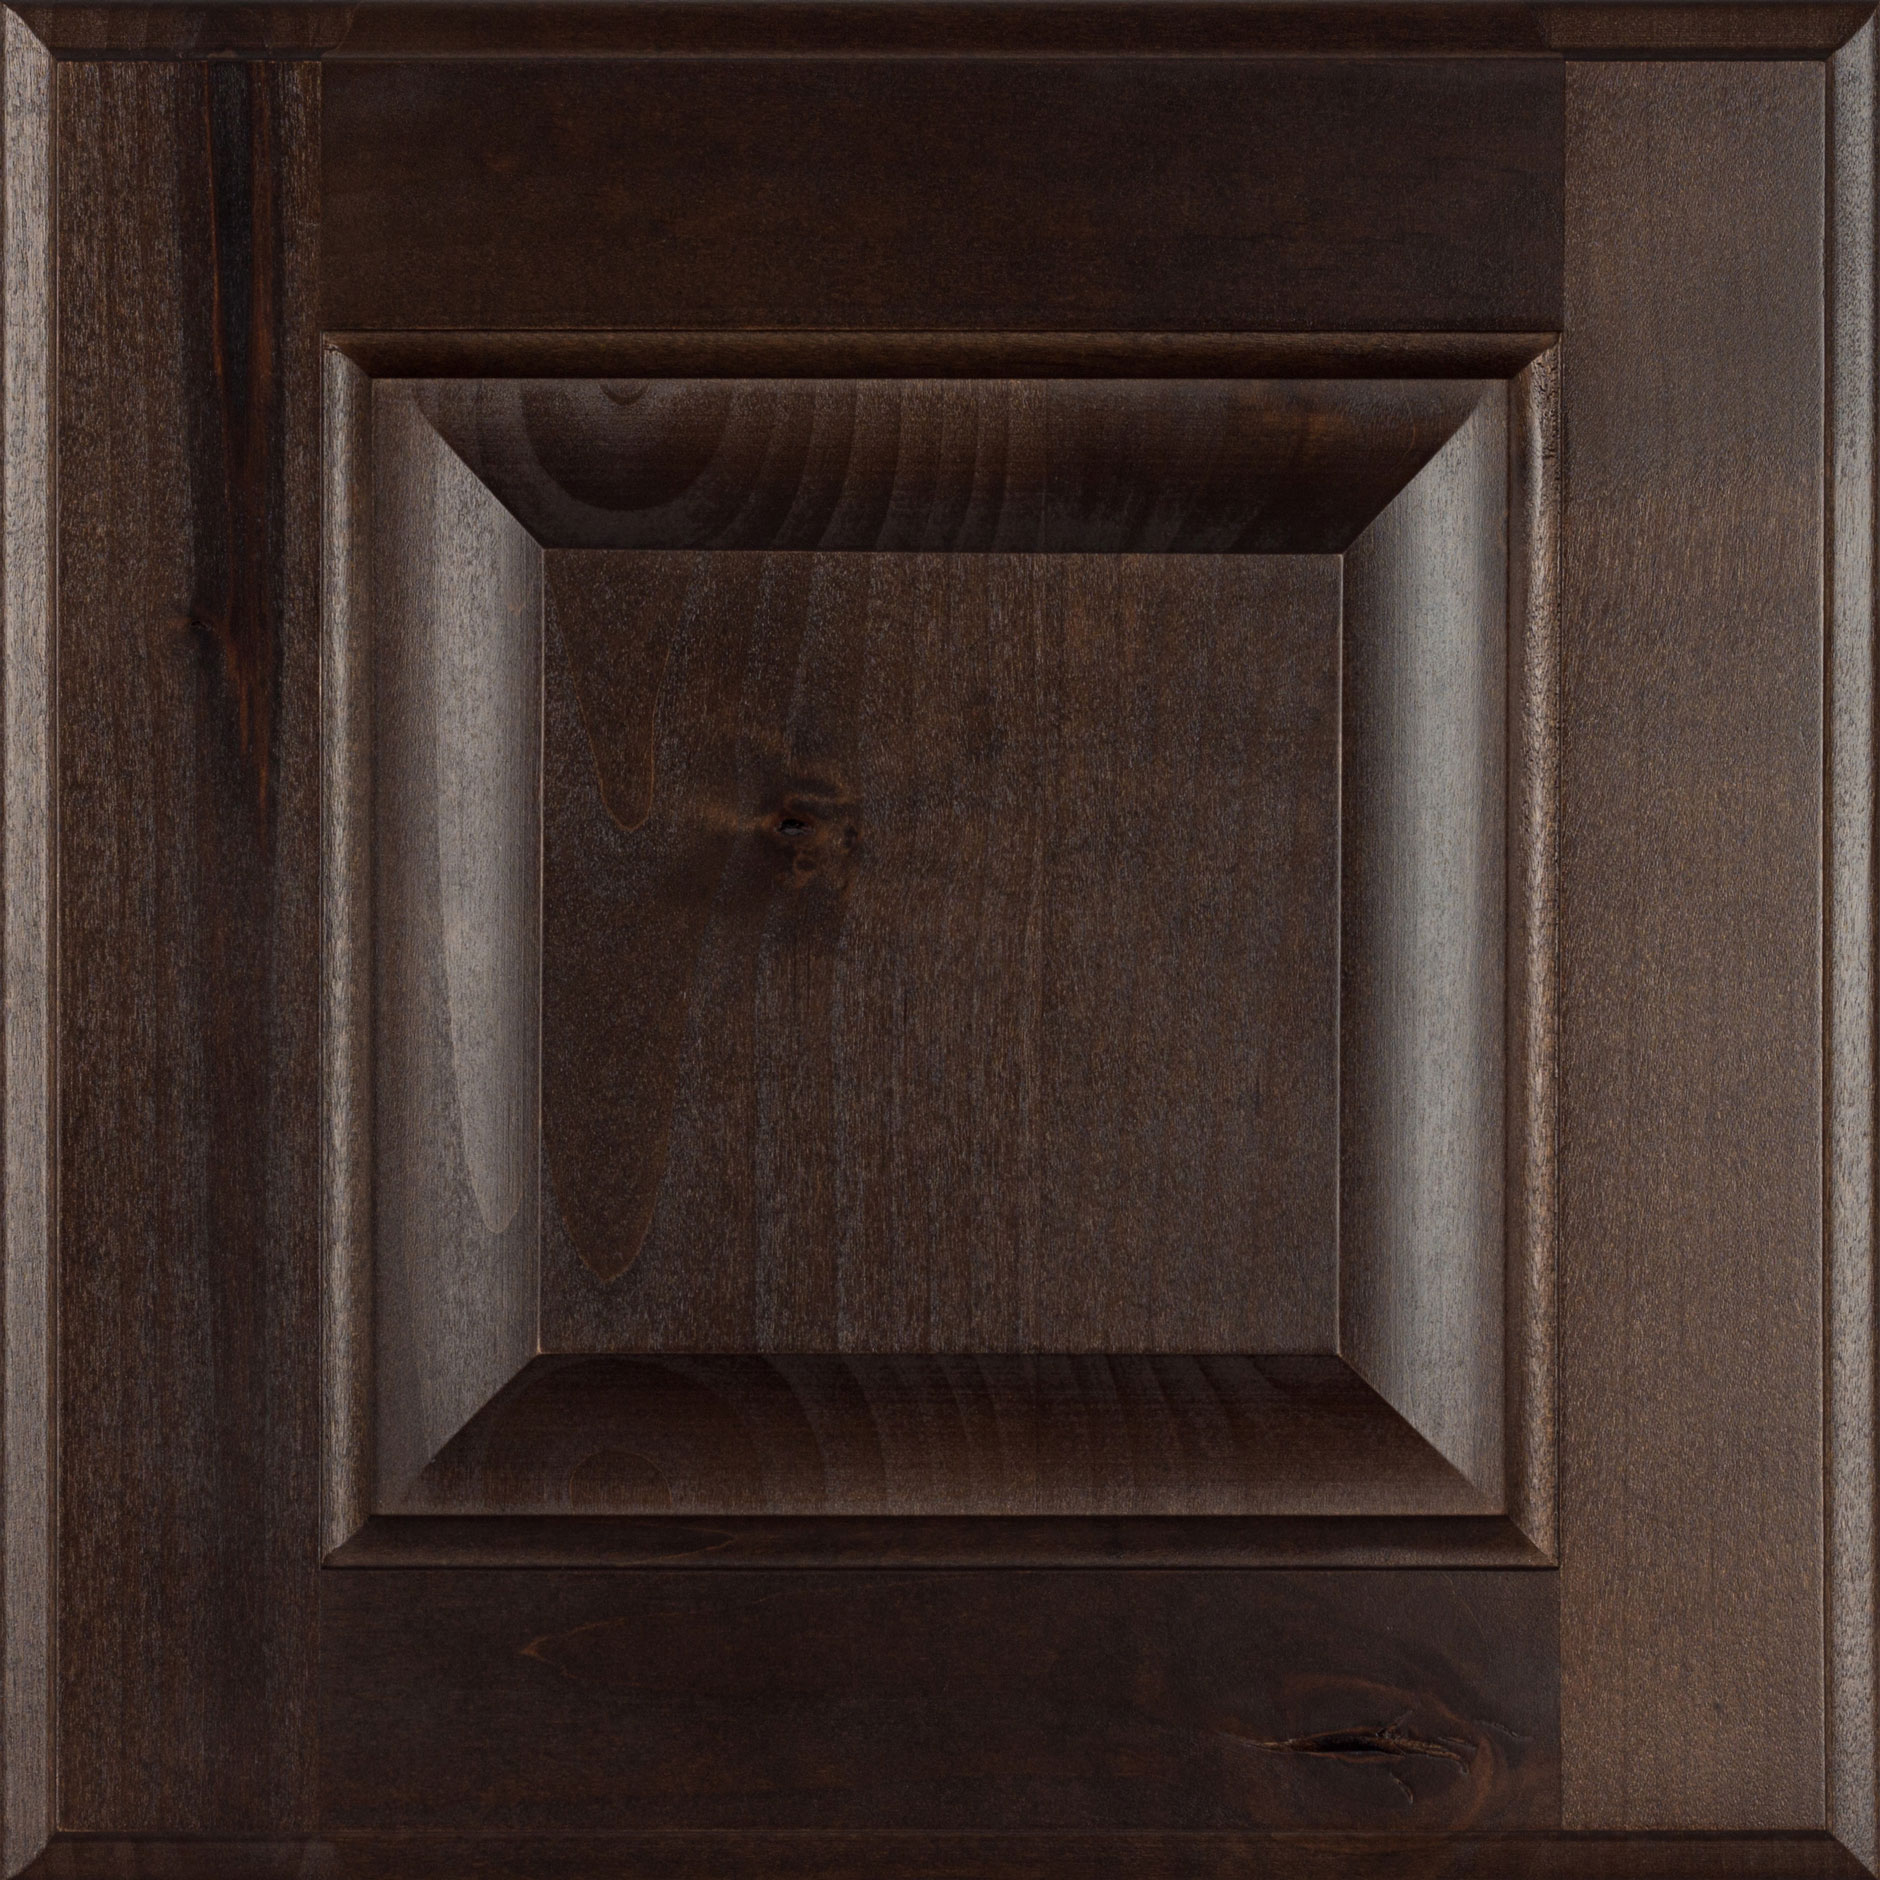 Knotty Maple Kitchen Cabinets: 5-Piece Raised Panel In Knotty Alder Kona